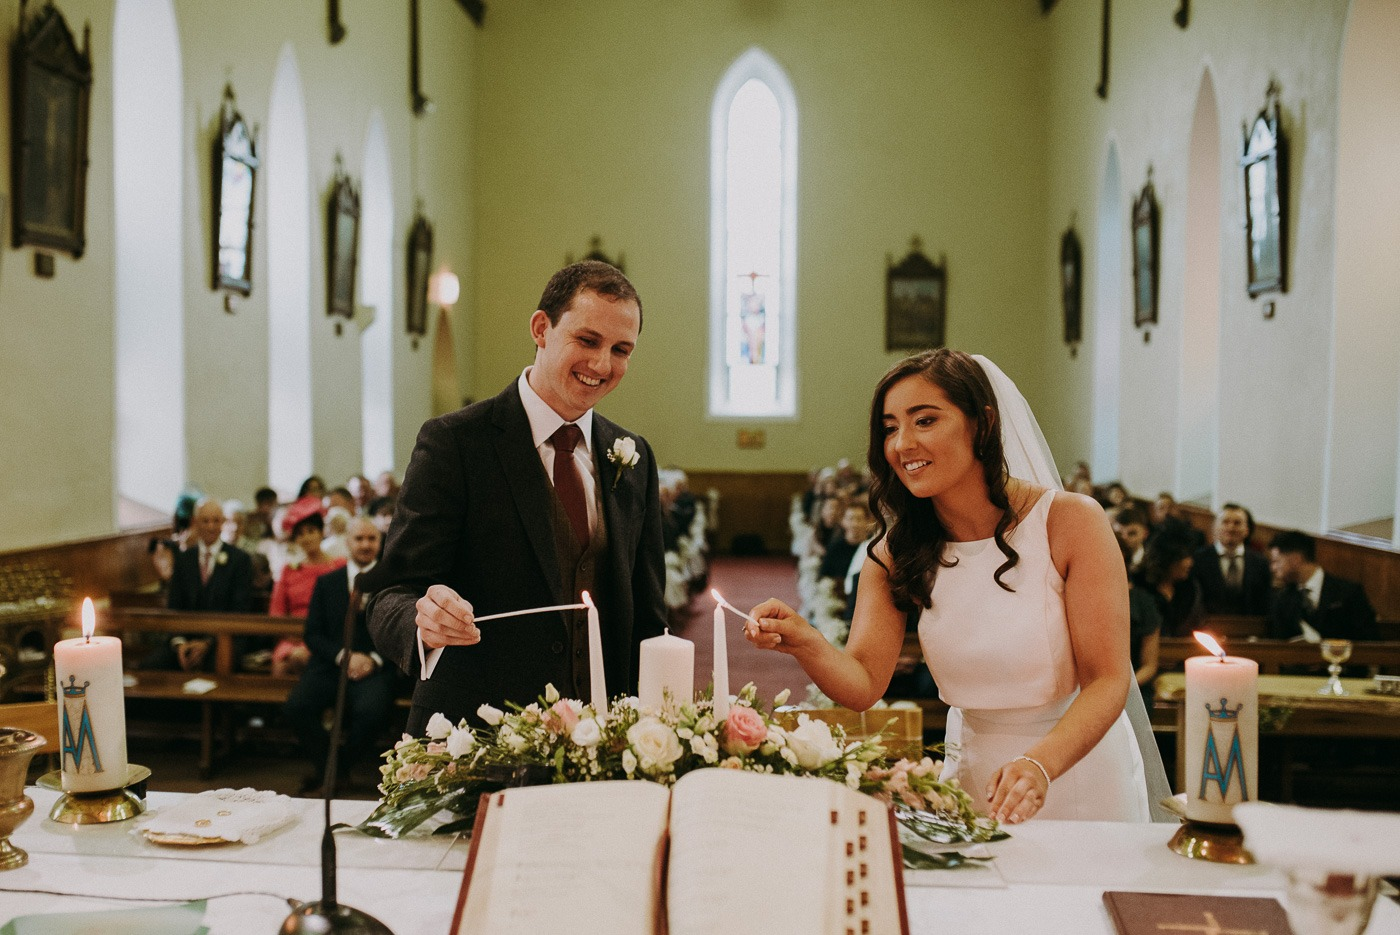 A person cutting a wedding cake